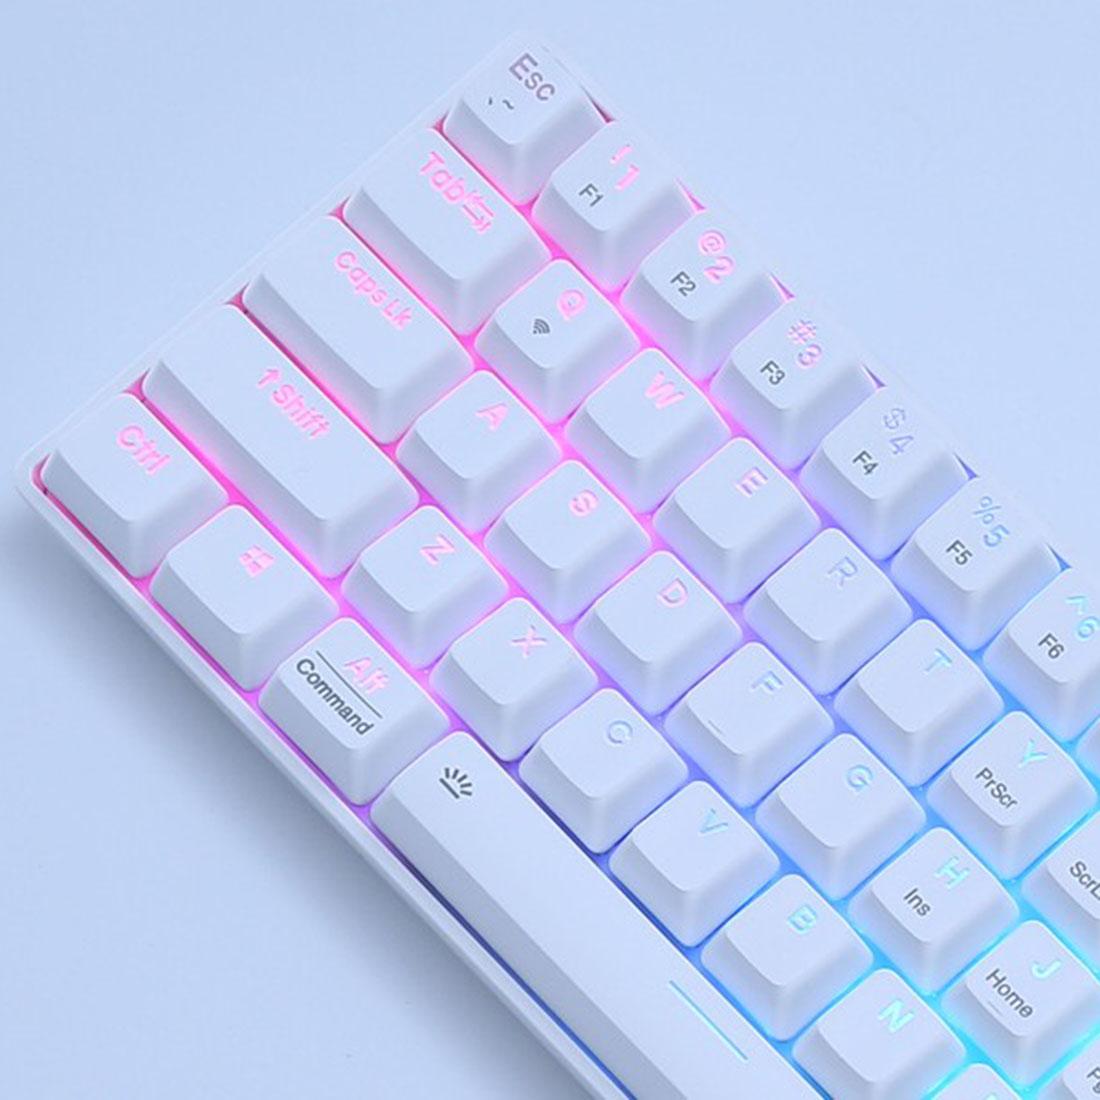 EK861 61-Key Gaming Mechanical Keyboard WirelessBluetooth+Wired Dual-mode RGB Backlit for Windows/Mac/Andoid